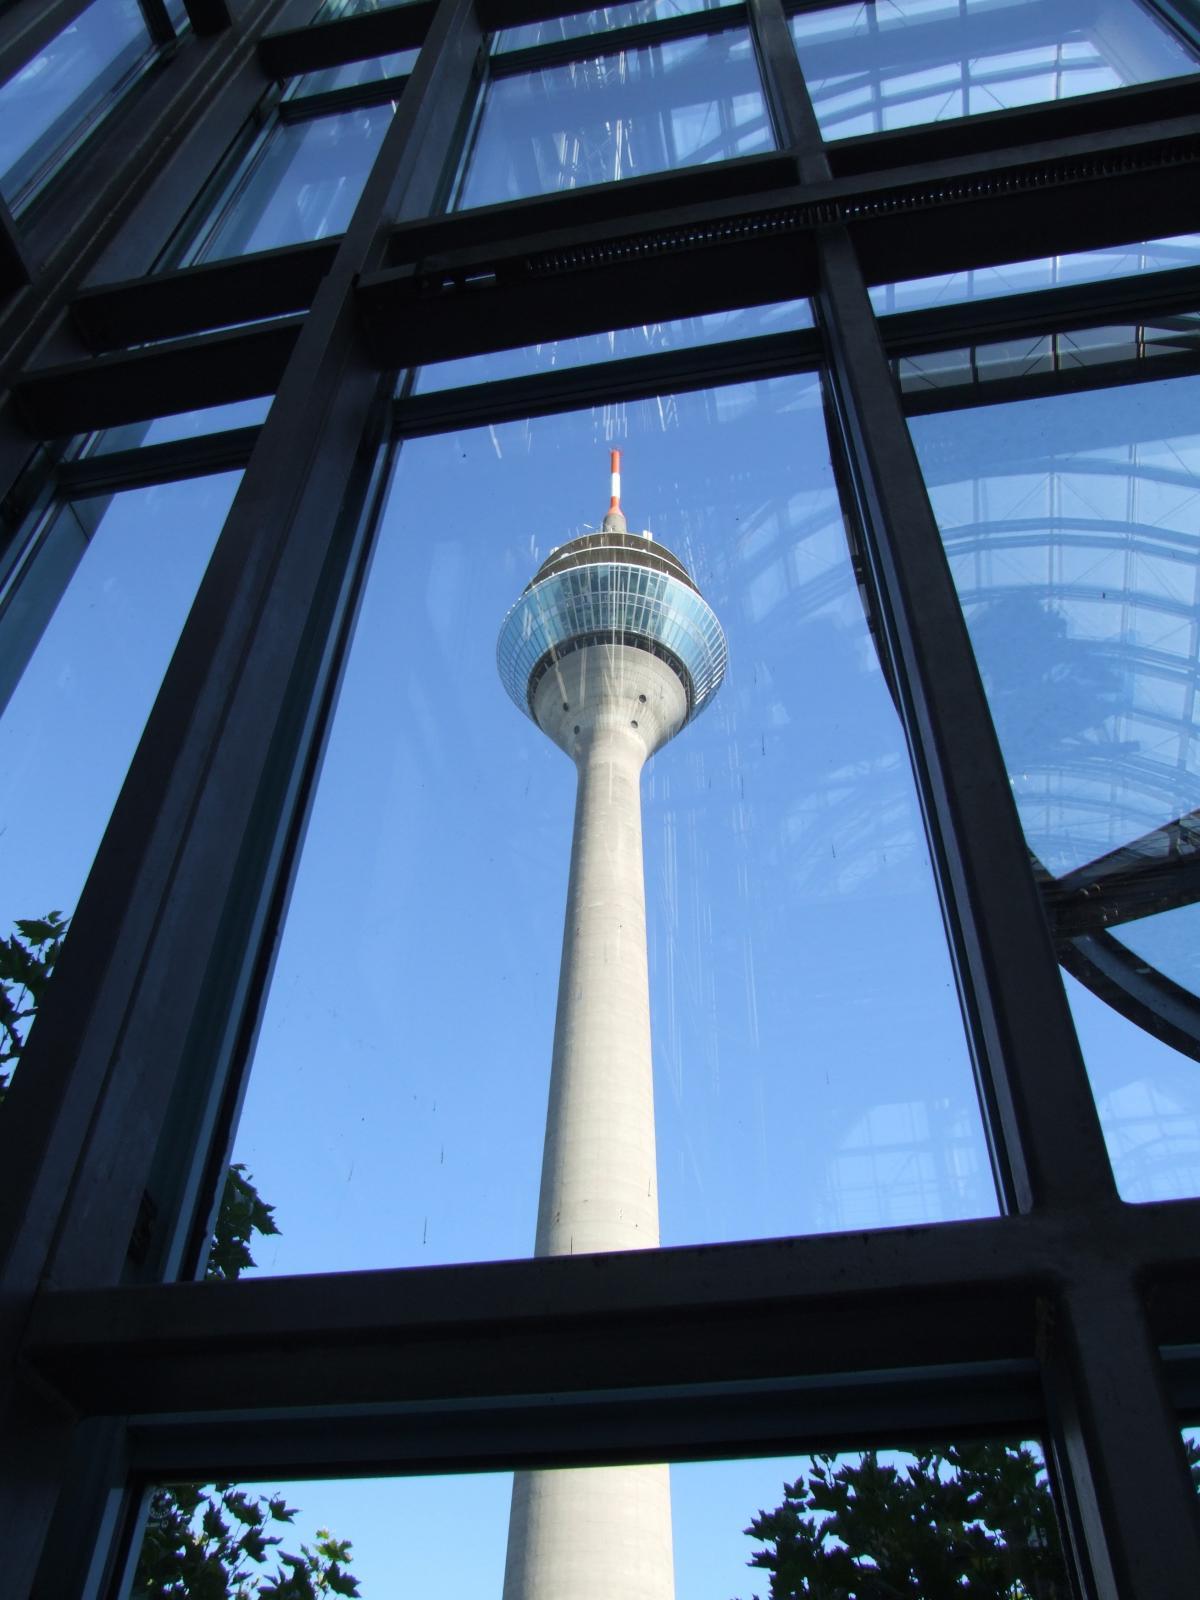 Architecture building city communication technology #82644